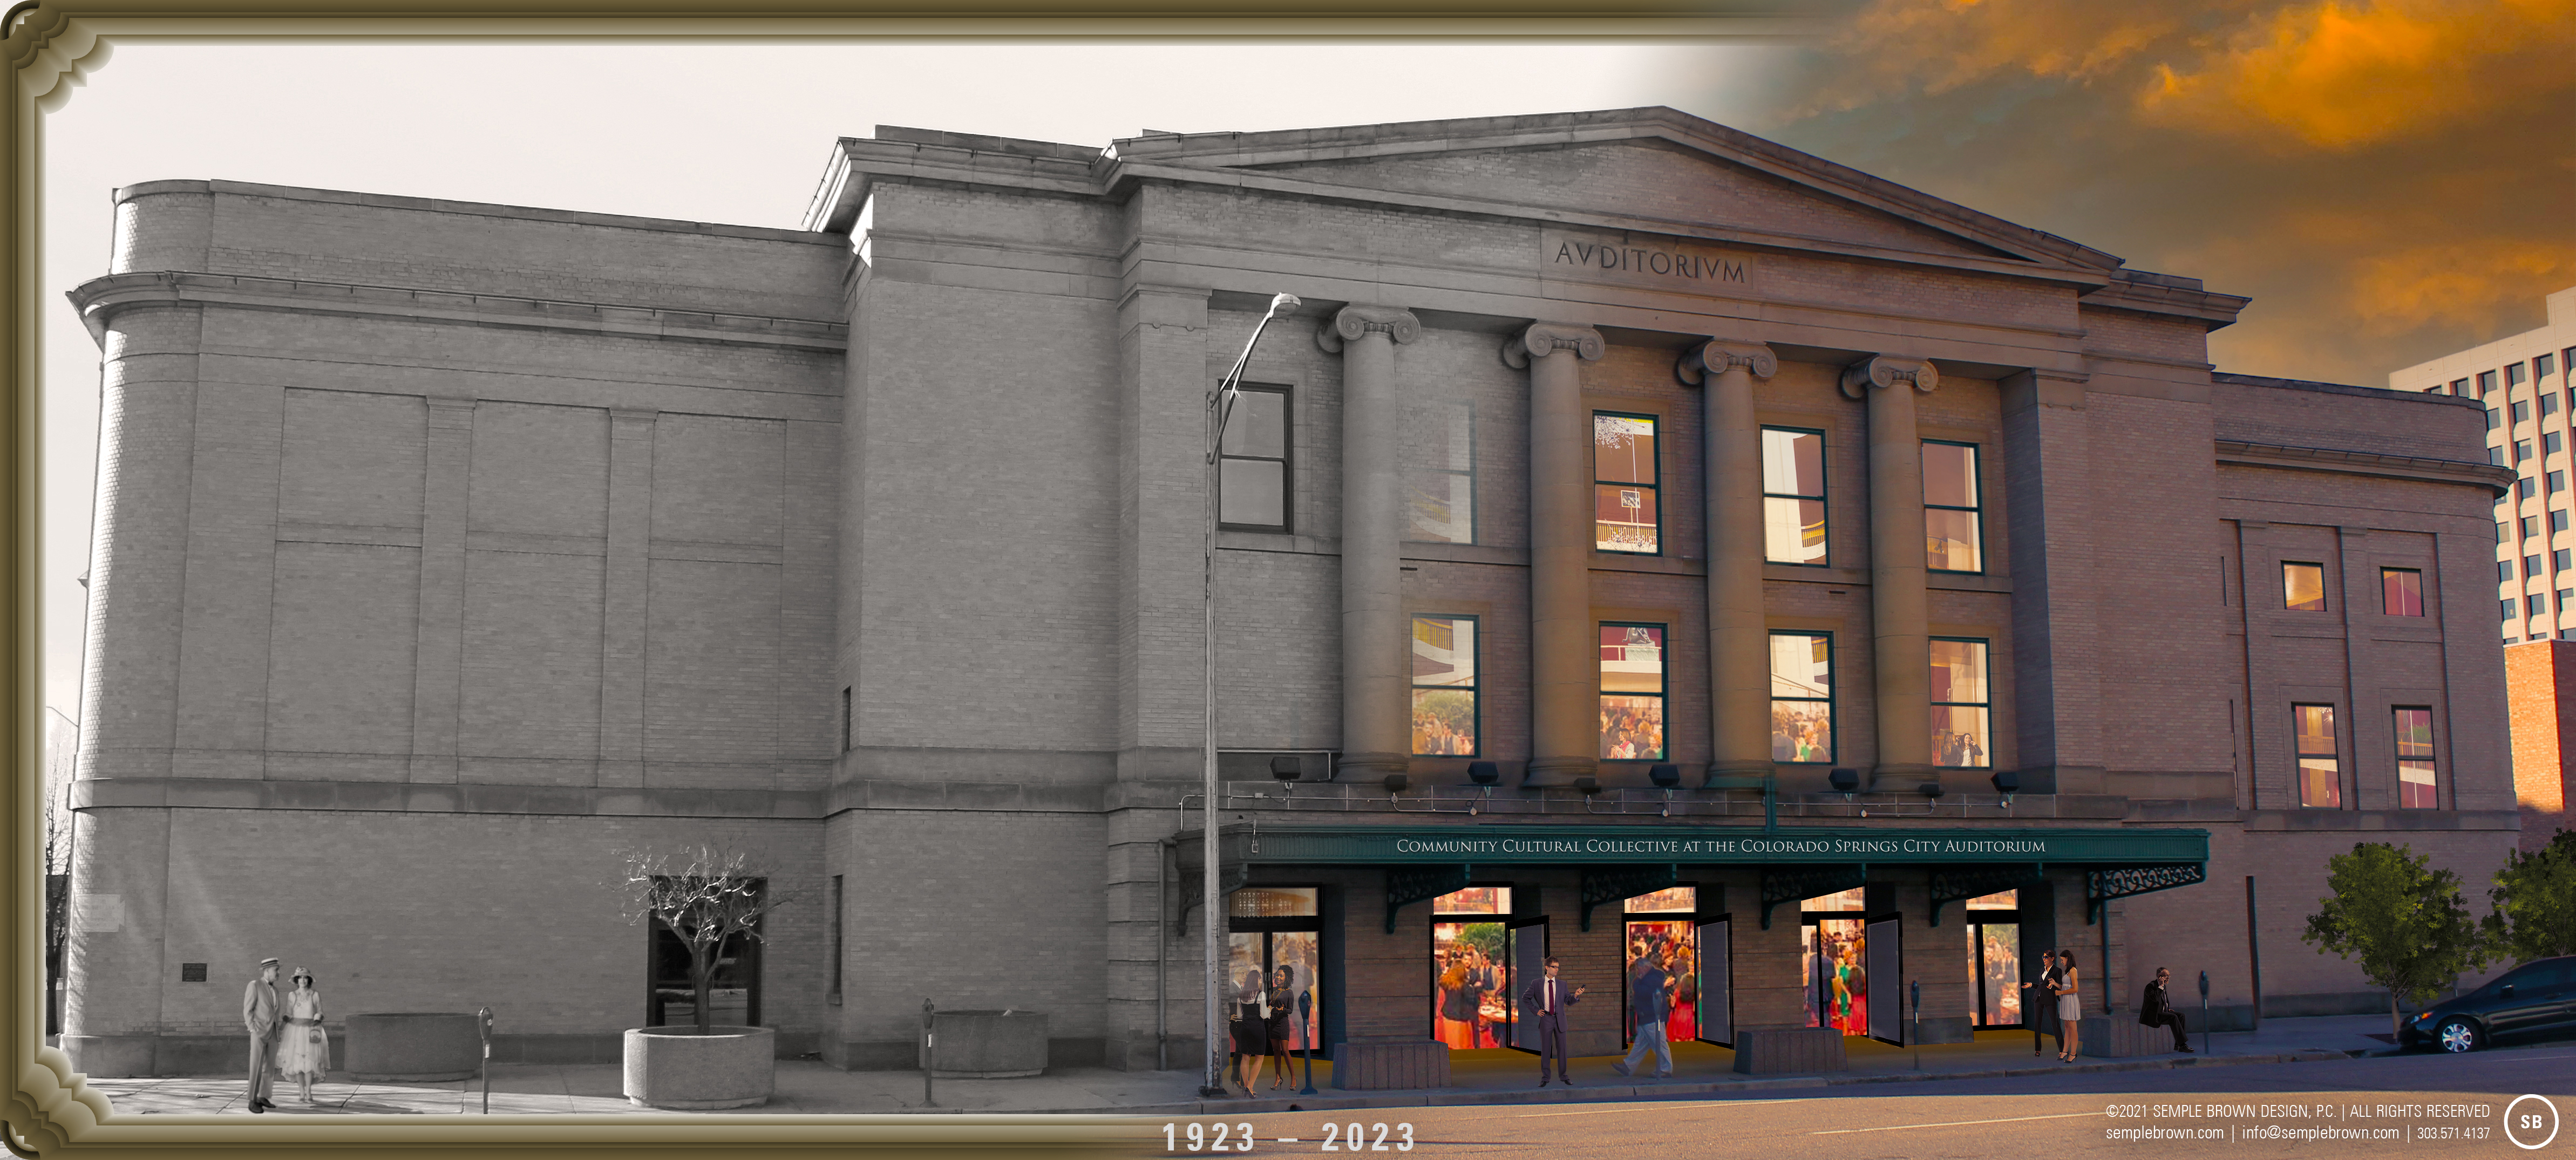 Exterior view of front of City Auditorium. 1932-2023